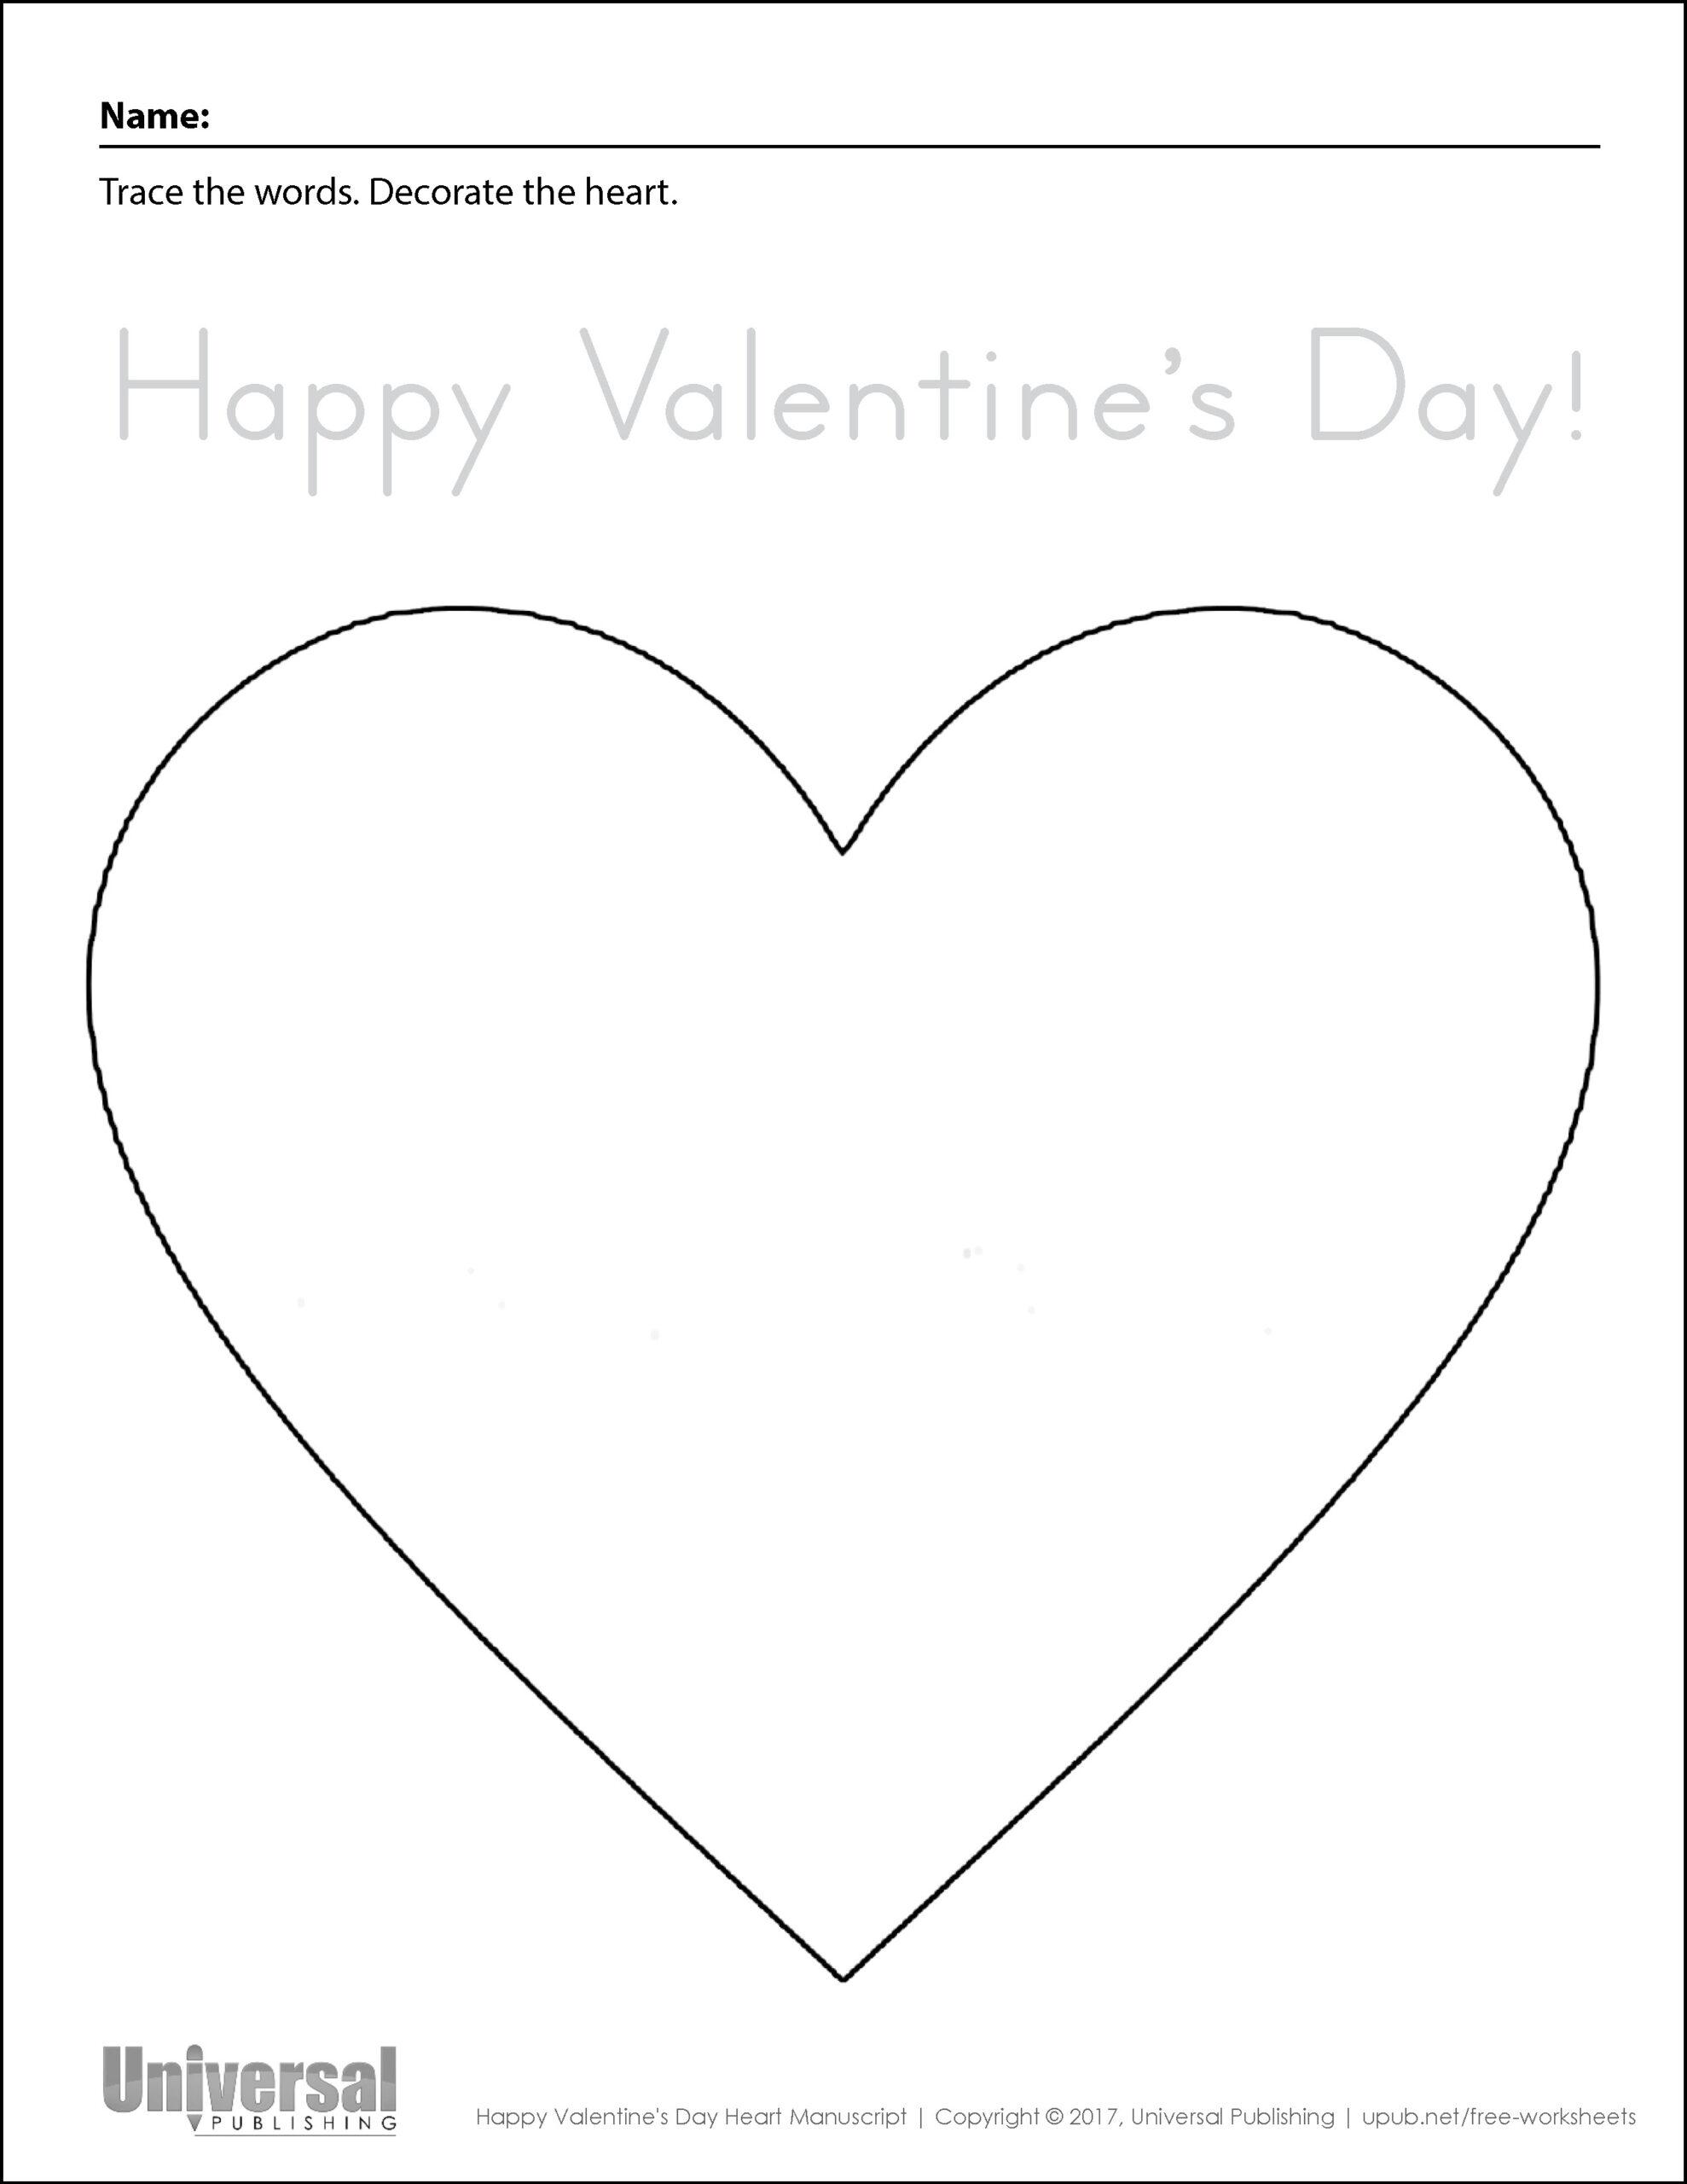 Heart Tracing Worksheet | Printable Worksheets And